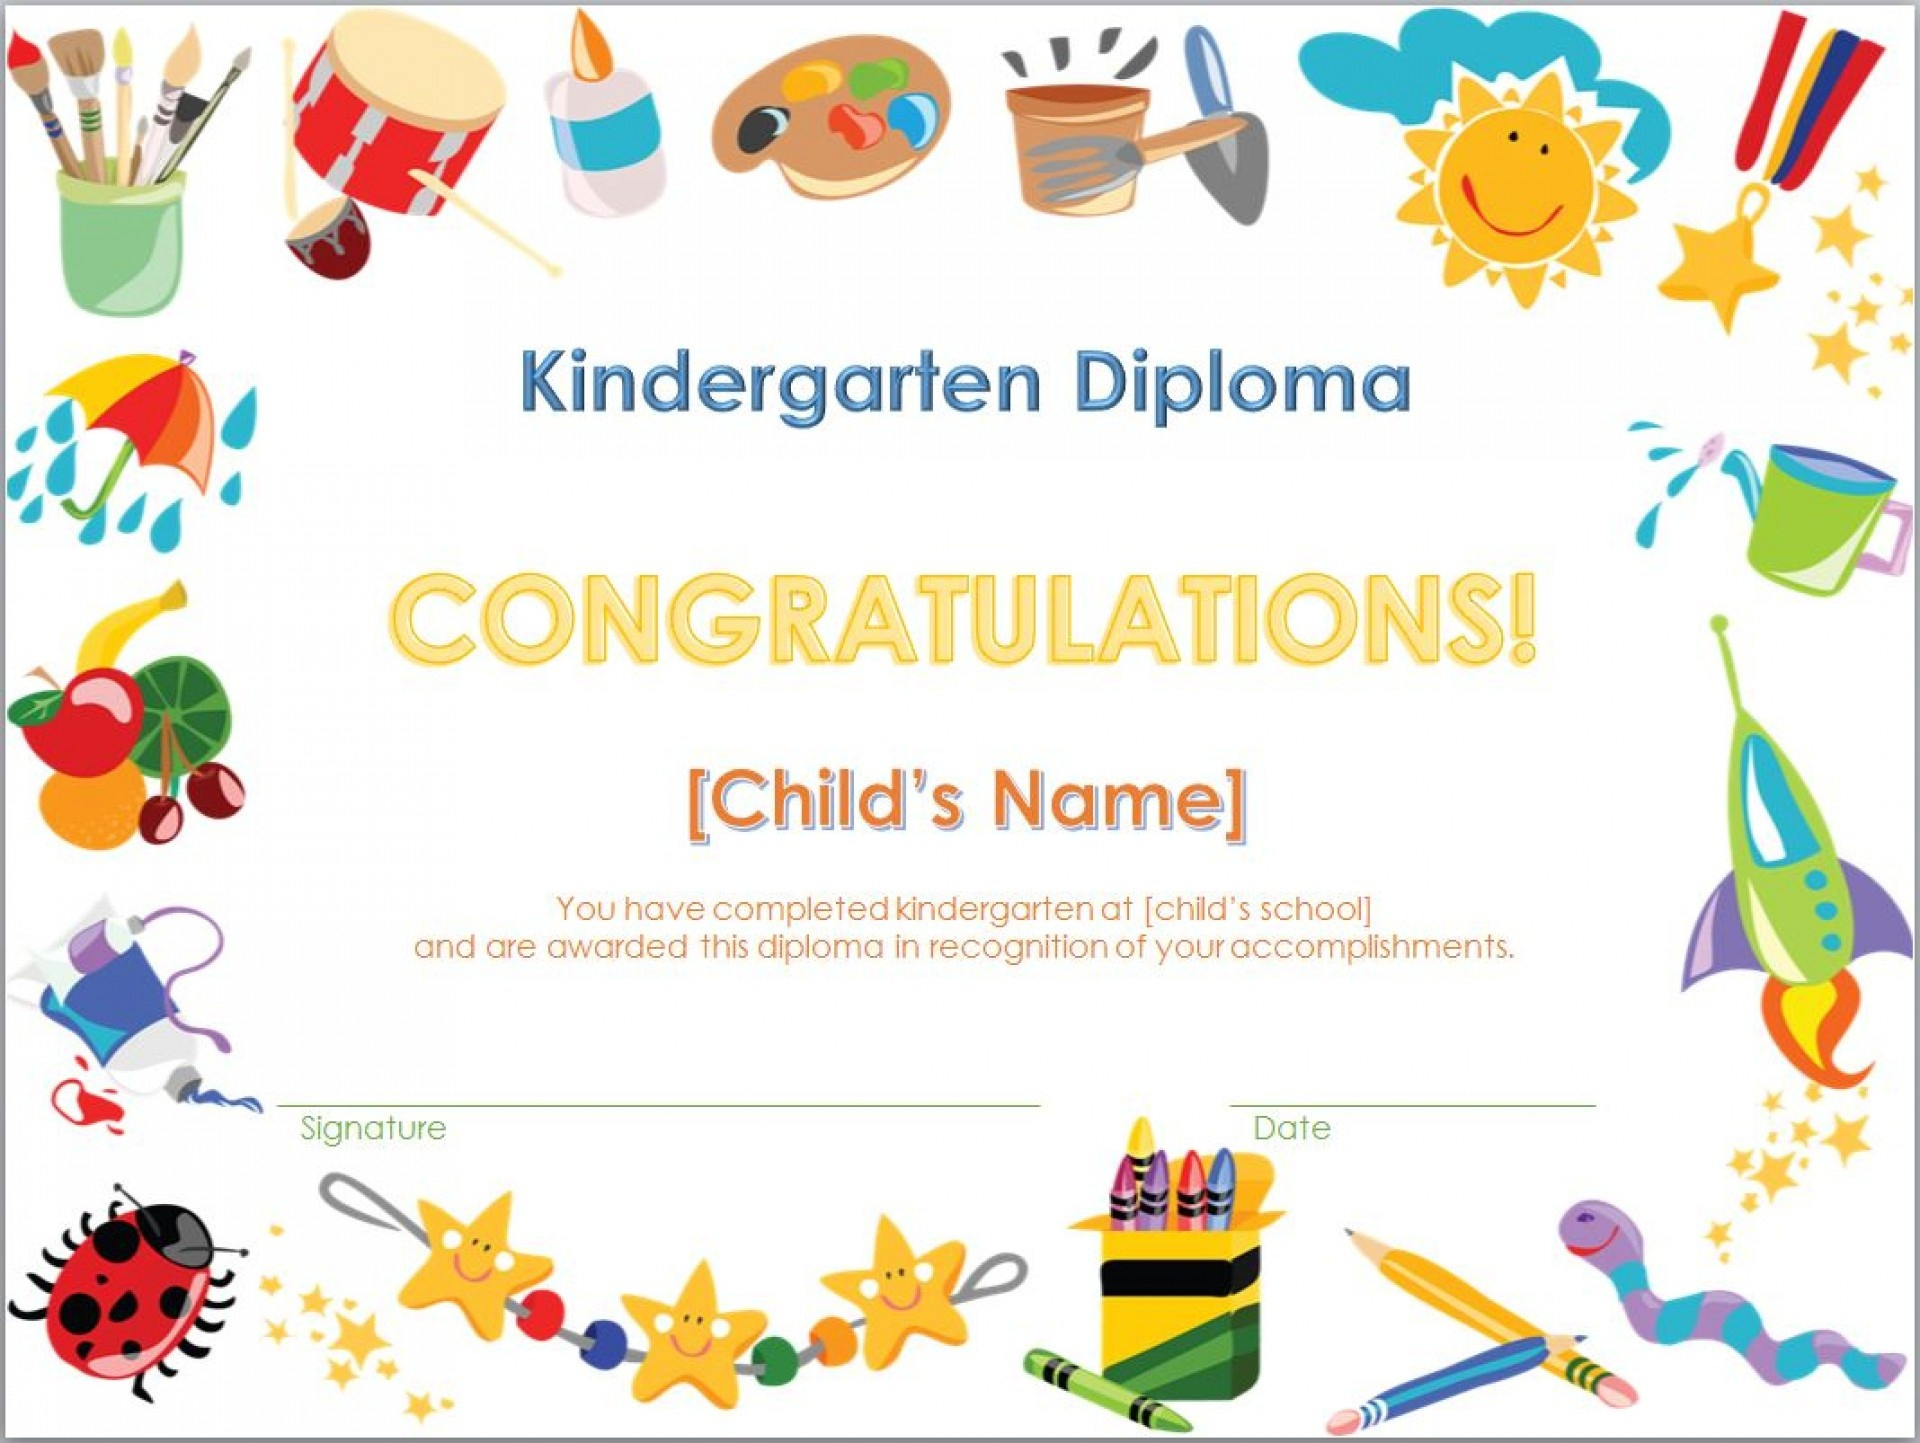 002 Certificate Template Free Printable Templates Diploma Wonderful - Free Printable Children's Certificates Templates